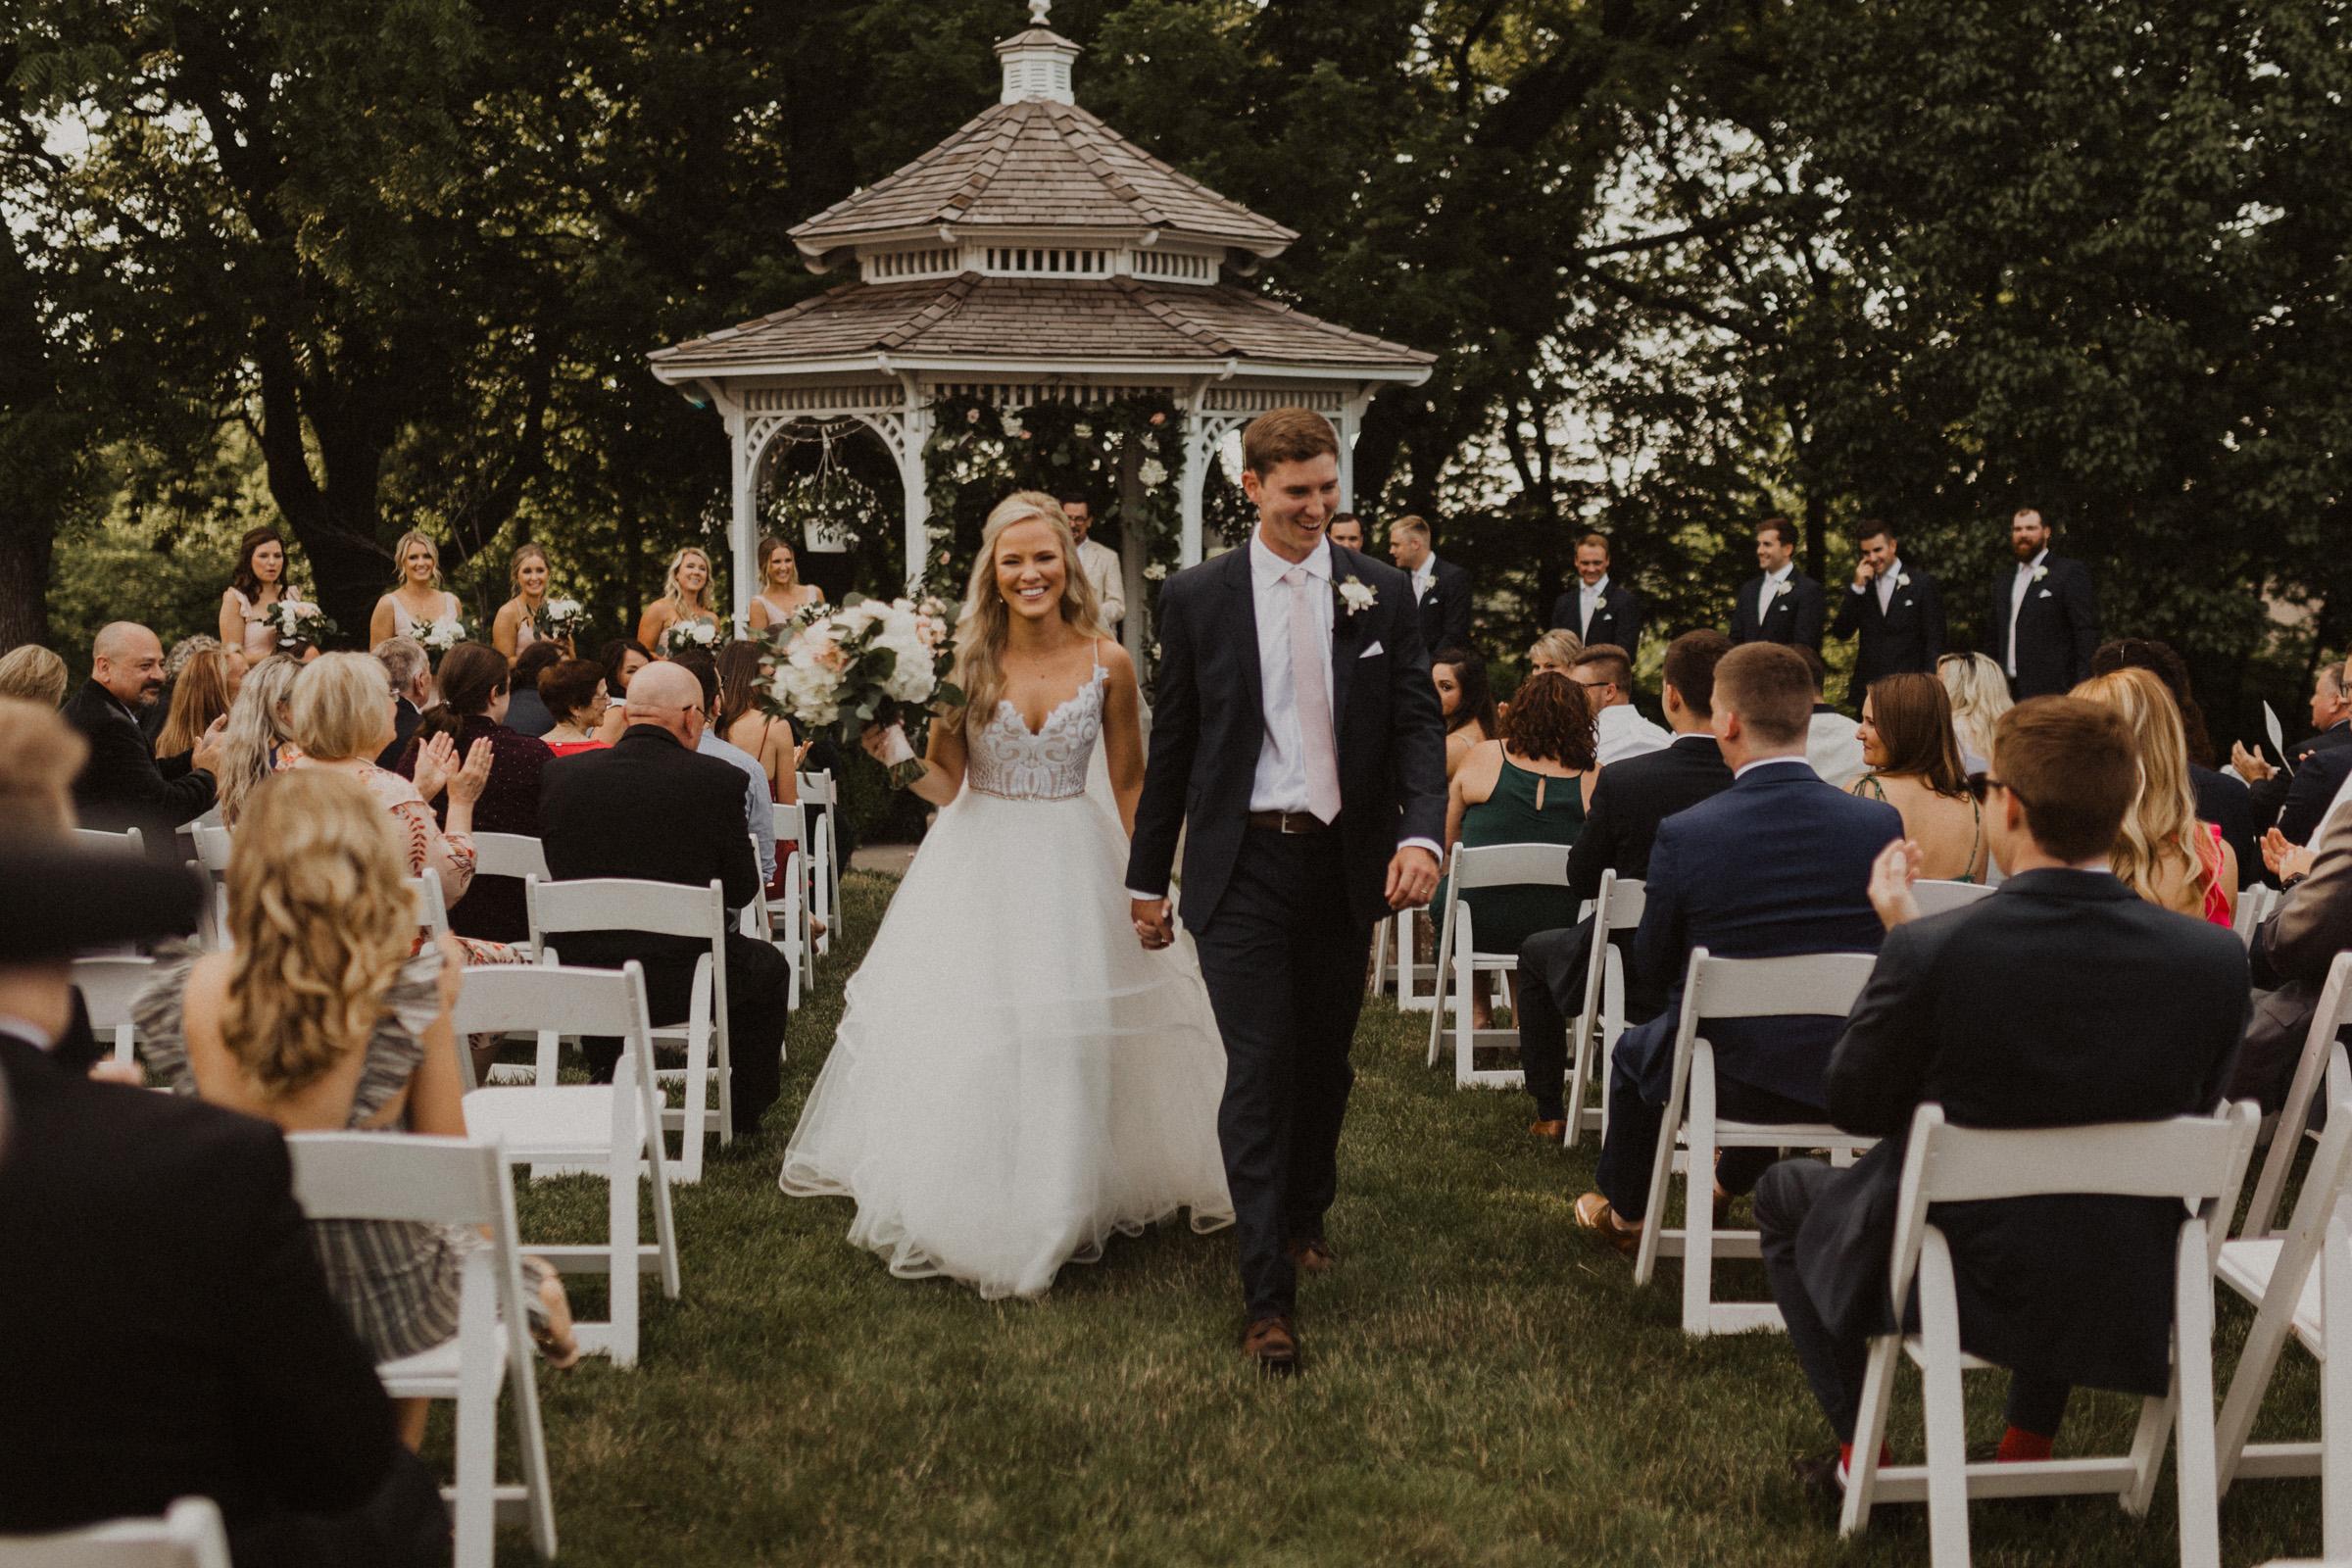 alyssa barletter photography hawthorne house summer outdoor wedding southern charm inspiration-51.jpg